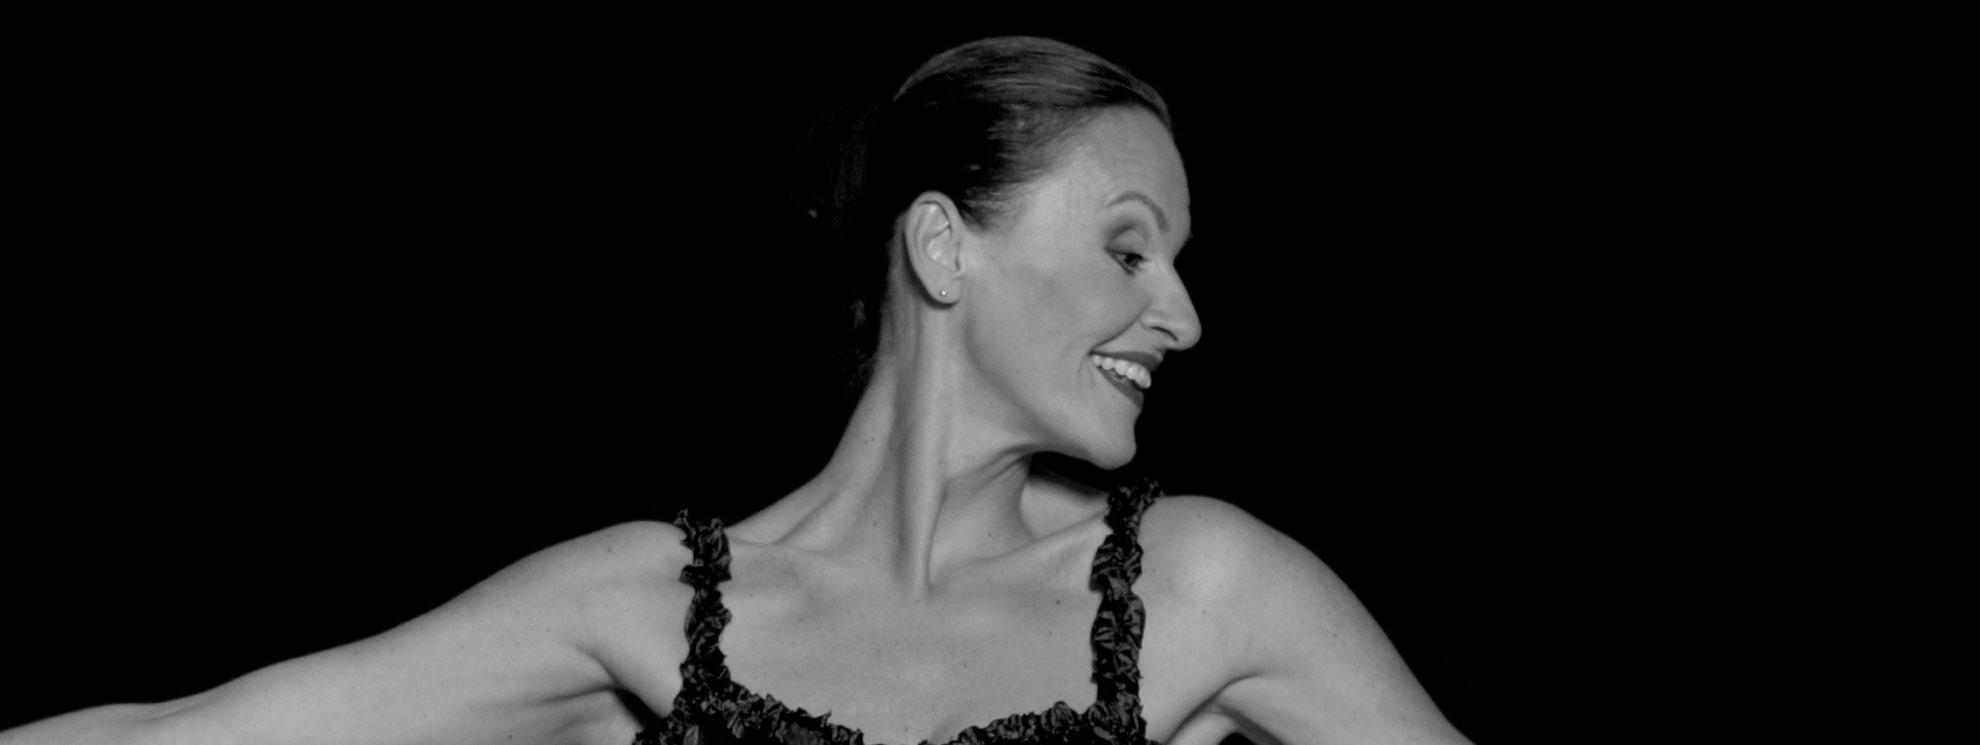 Bettina Habekost   Tanz - Choreographie - Performance